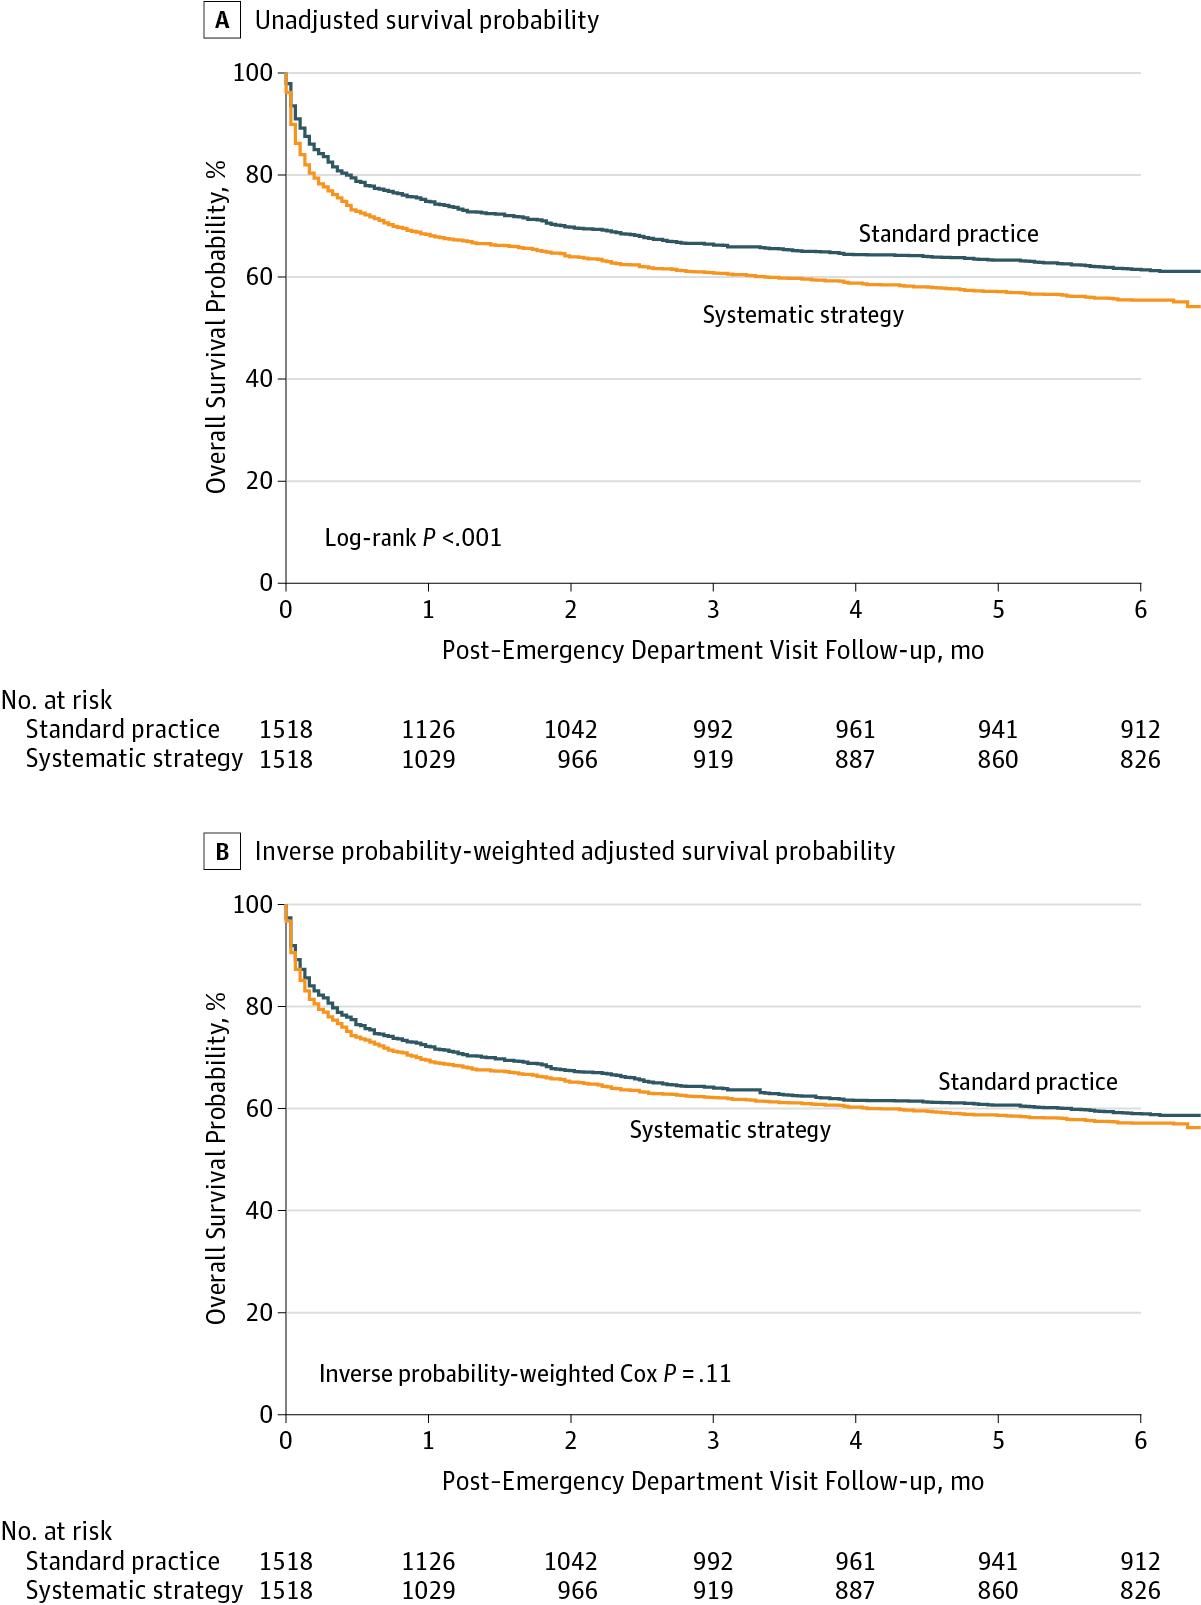 [JAMA在线发表]:系统性收入ICU不能改善老年危重病患者远期病死率